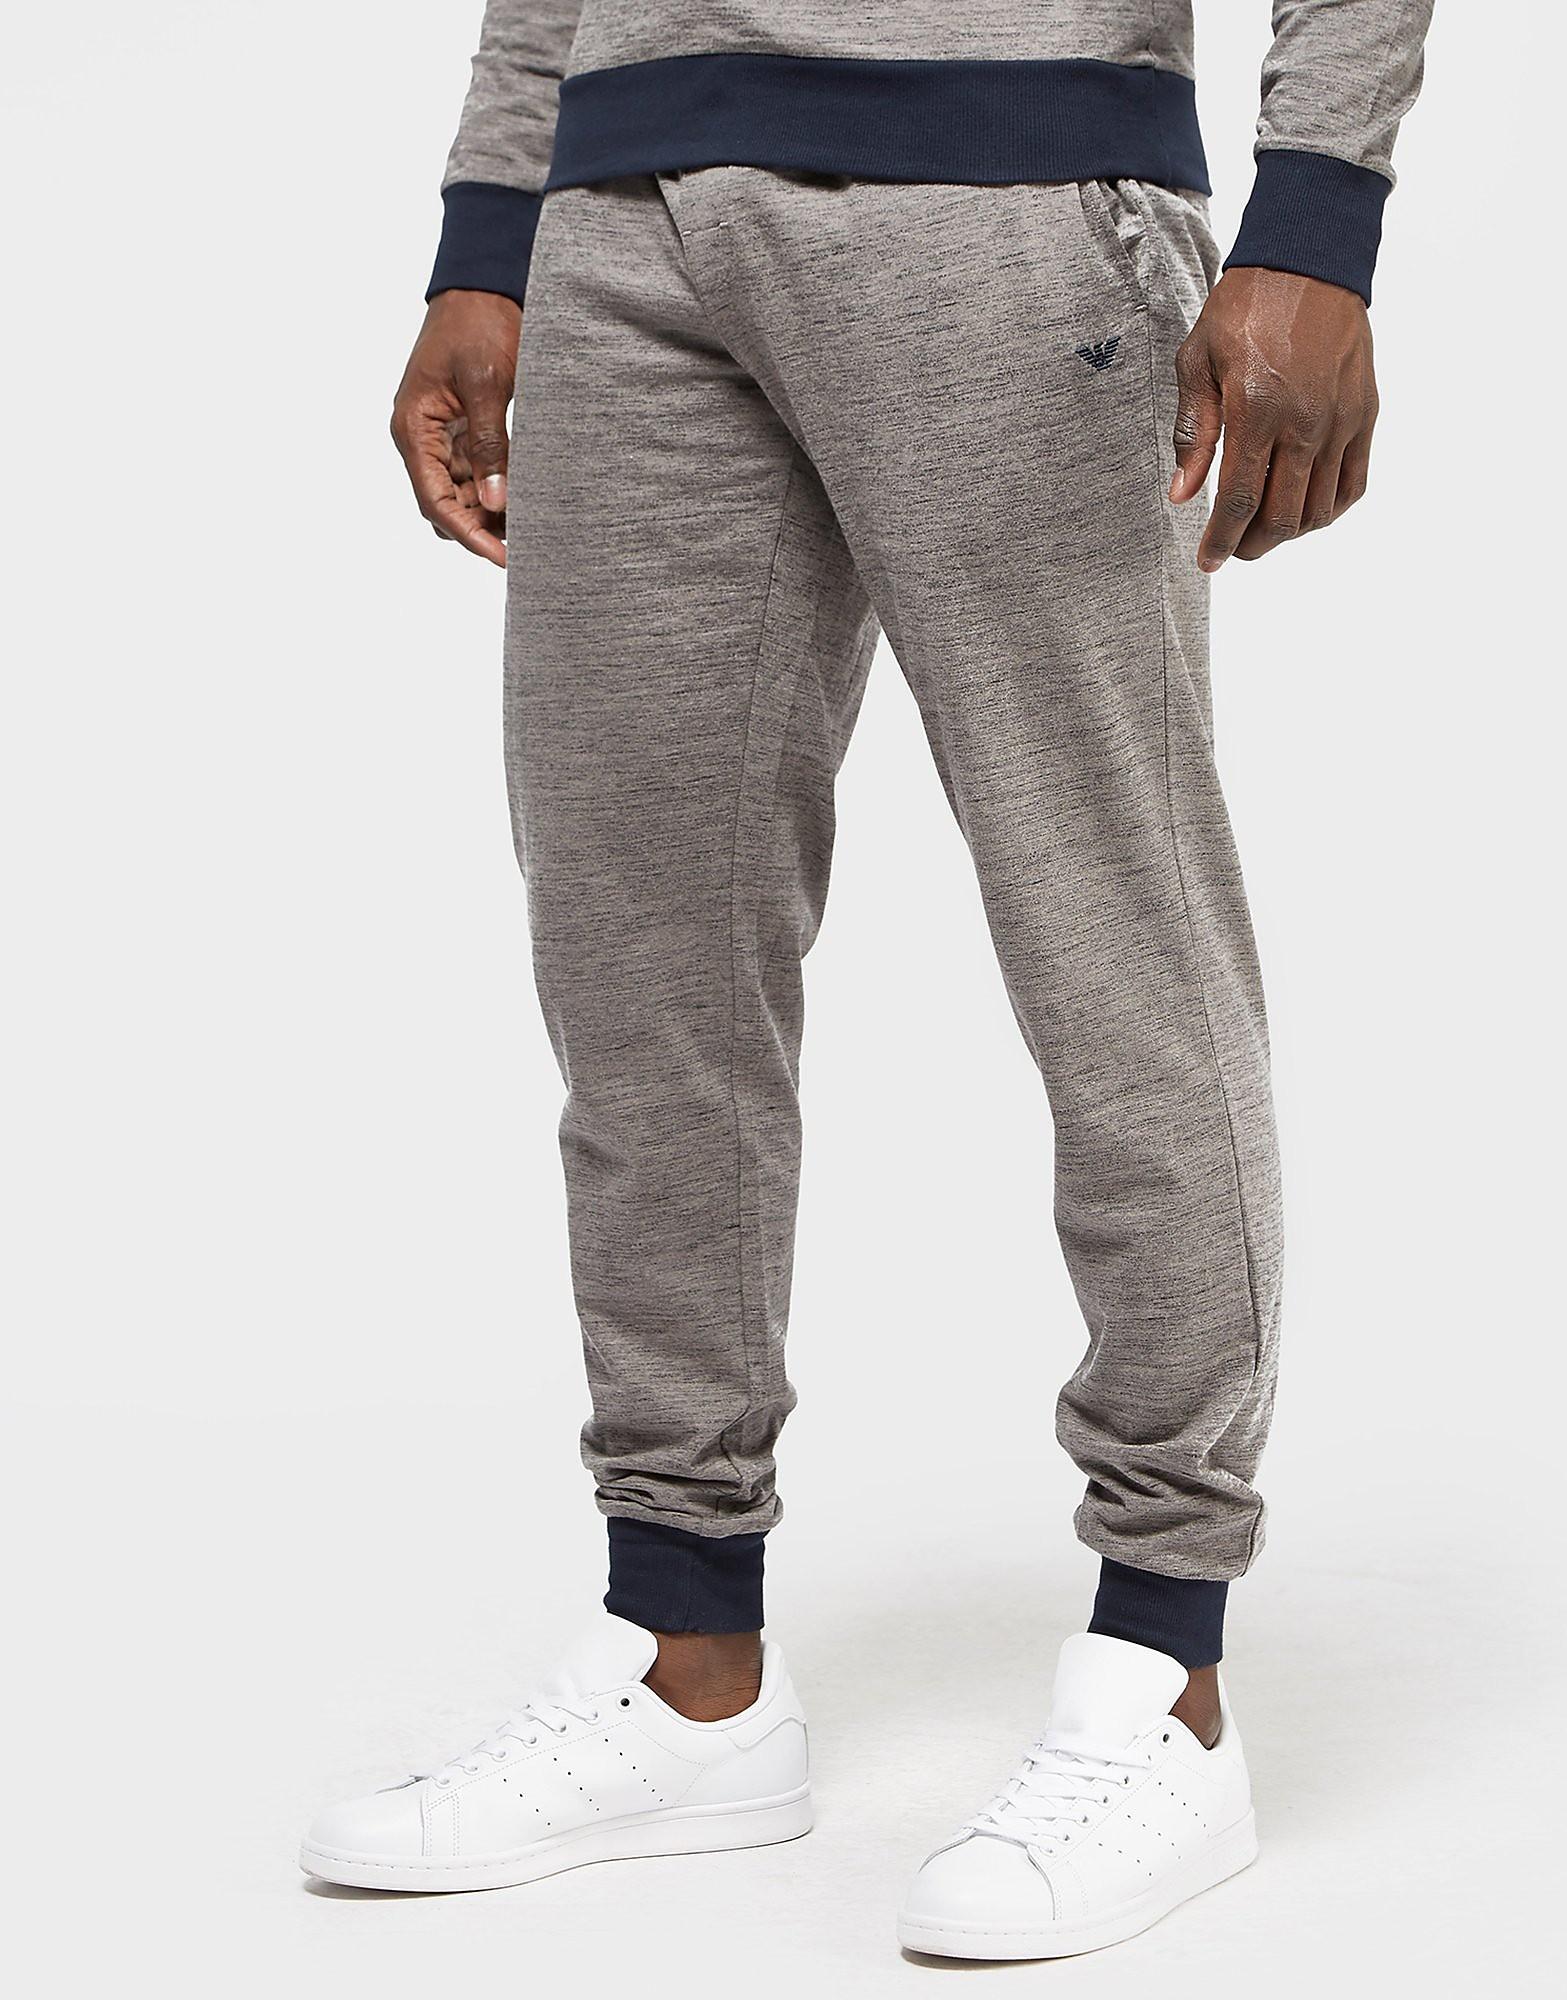 Emporio Armani Fleece Cuff Track Pants